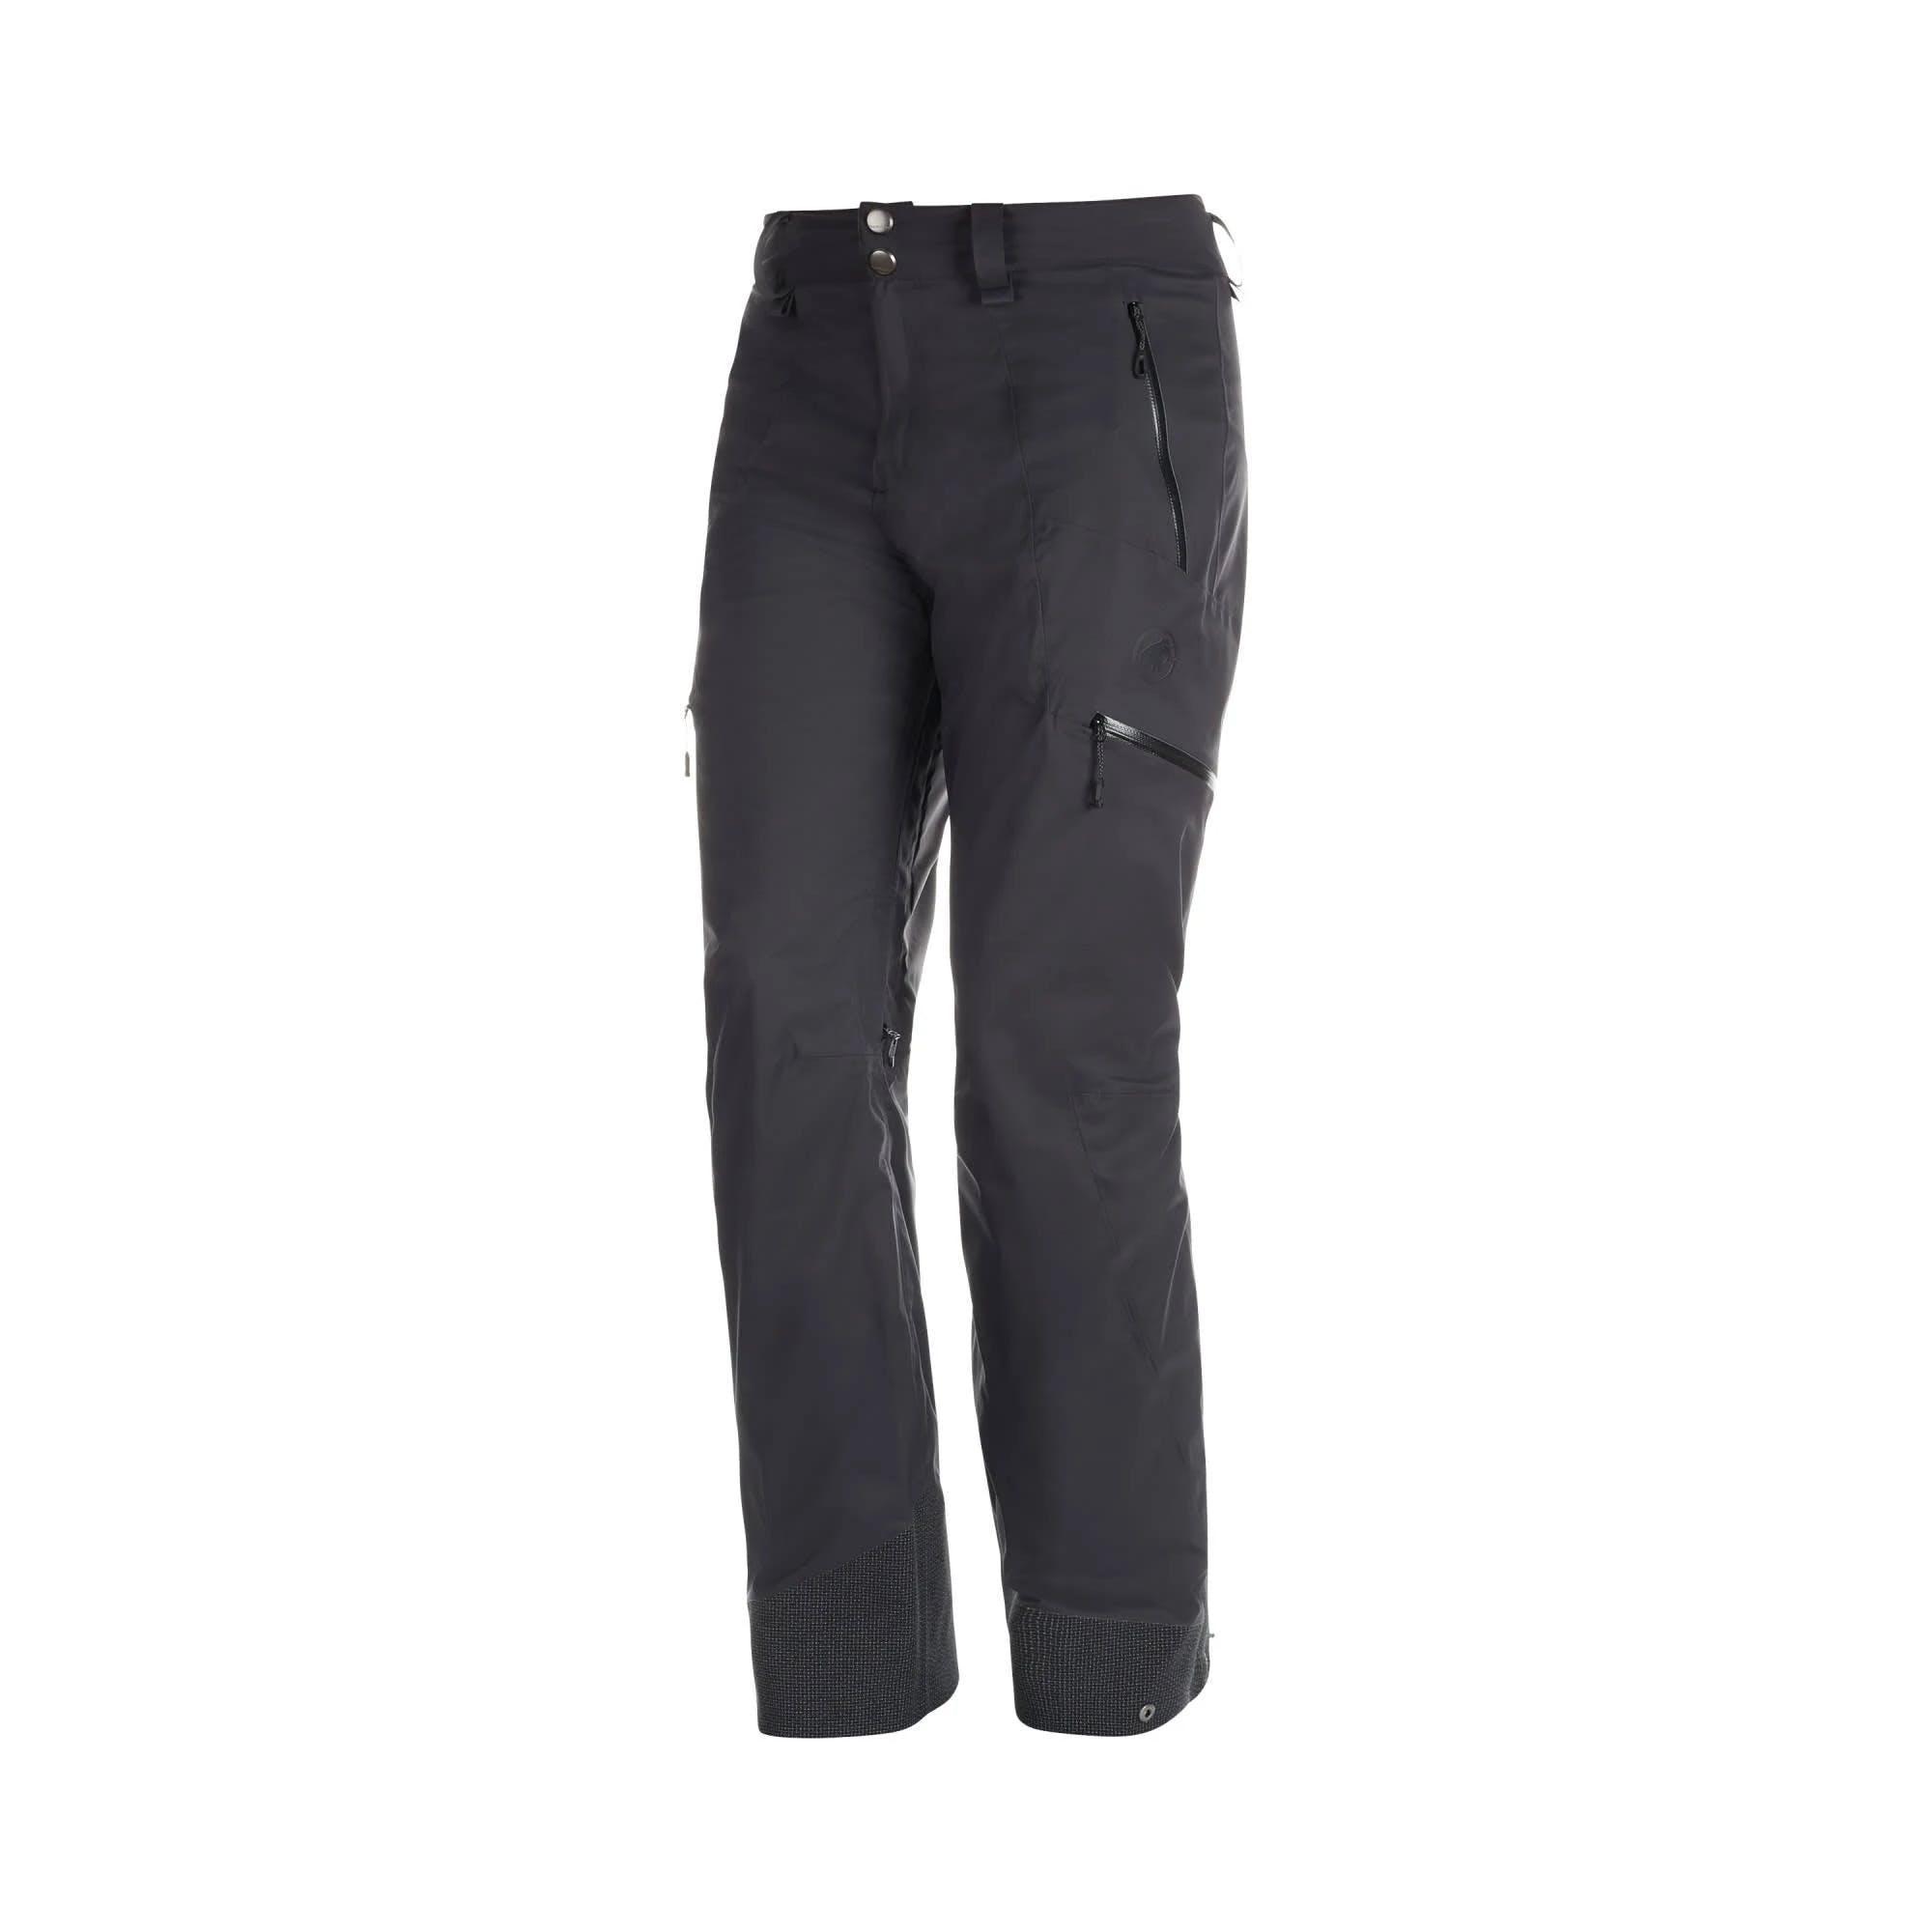 Mammut Men's Stoney HS Pants Black 34